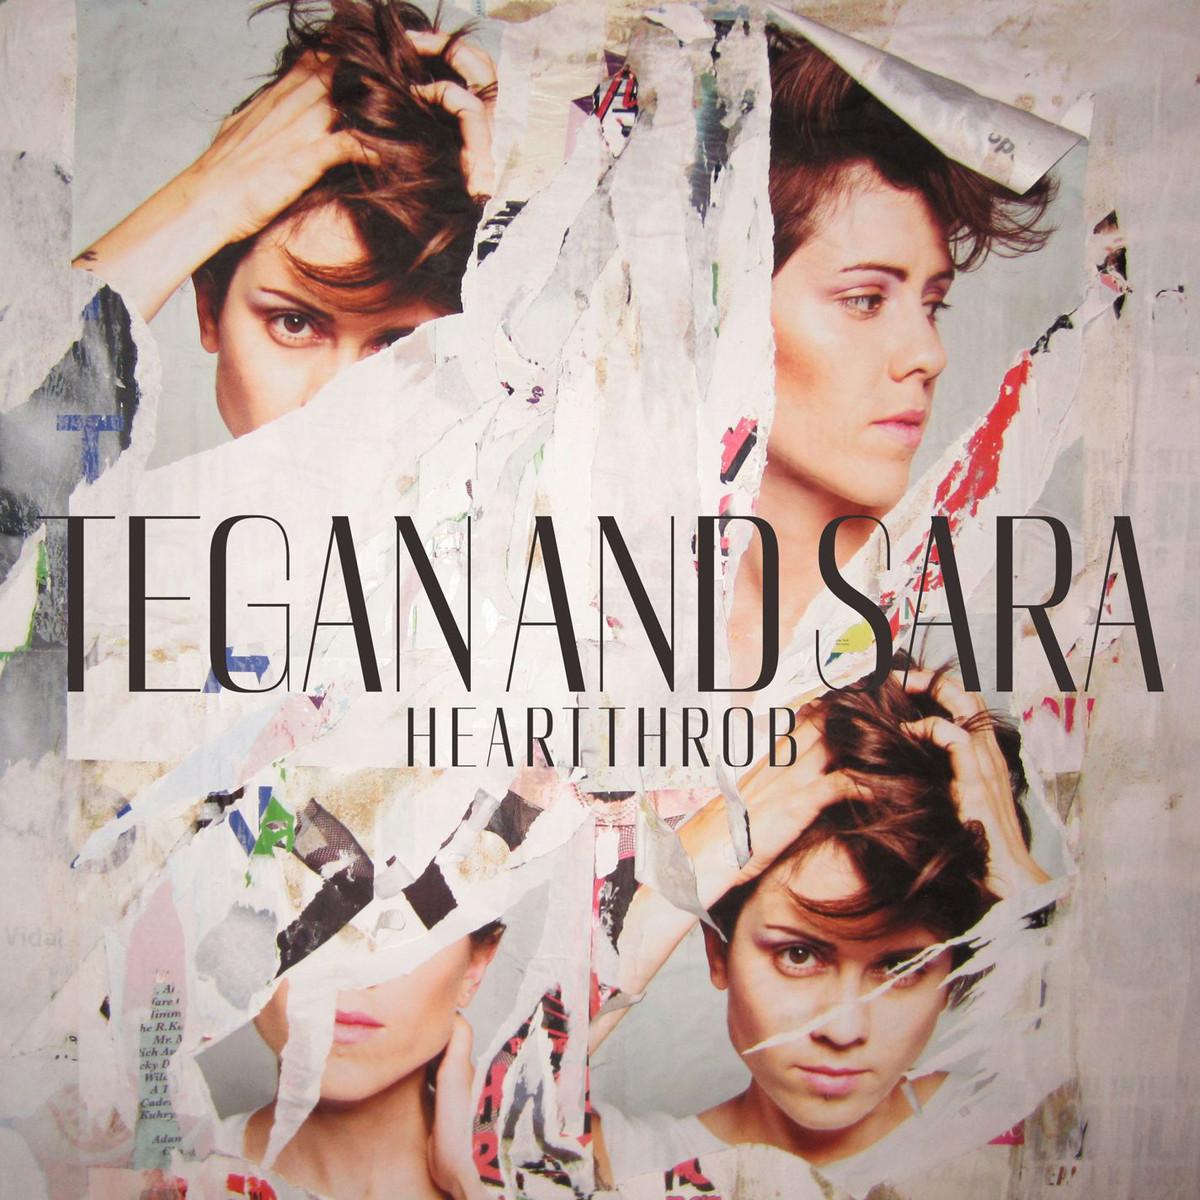 Top 25 Albums Of 2013 4 Tegan And Sara Heartthrob Robs